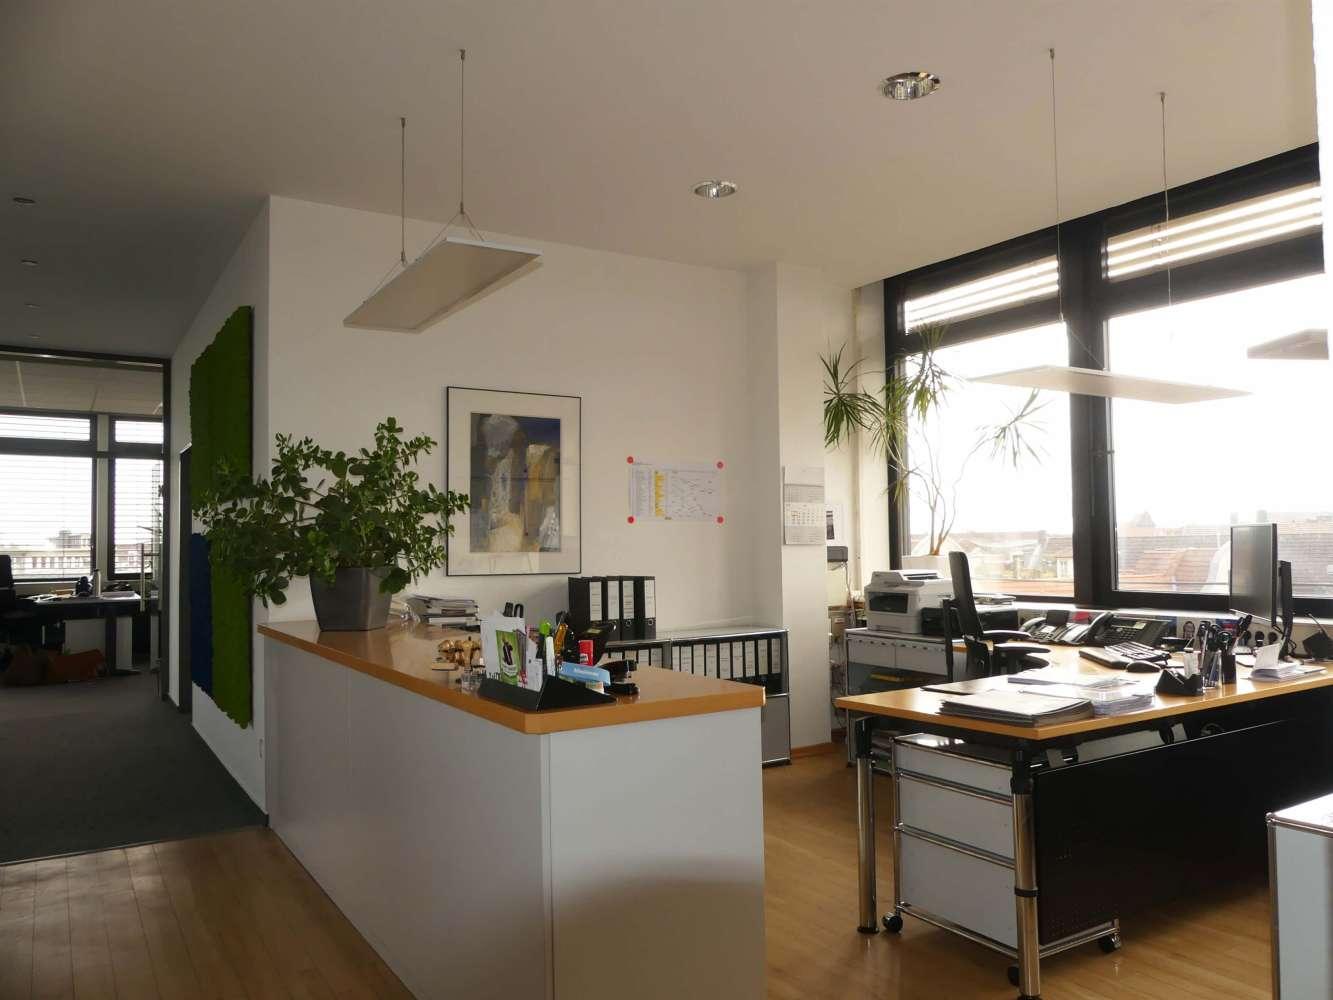 Büros Bielefeld, 33602 - Büro - Bielefeld, Innenstadt - H1486 - 10566484